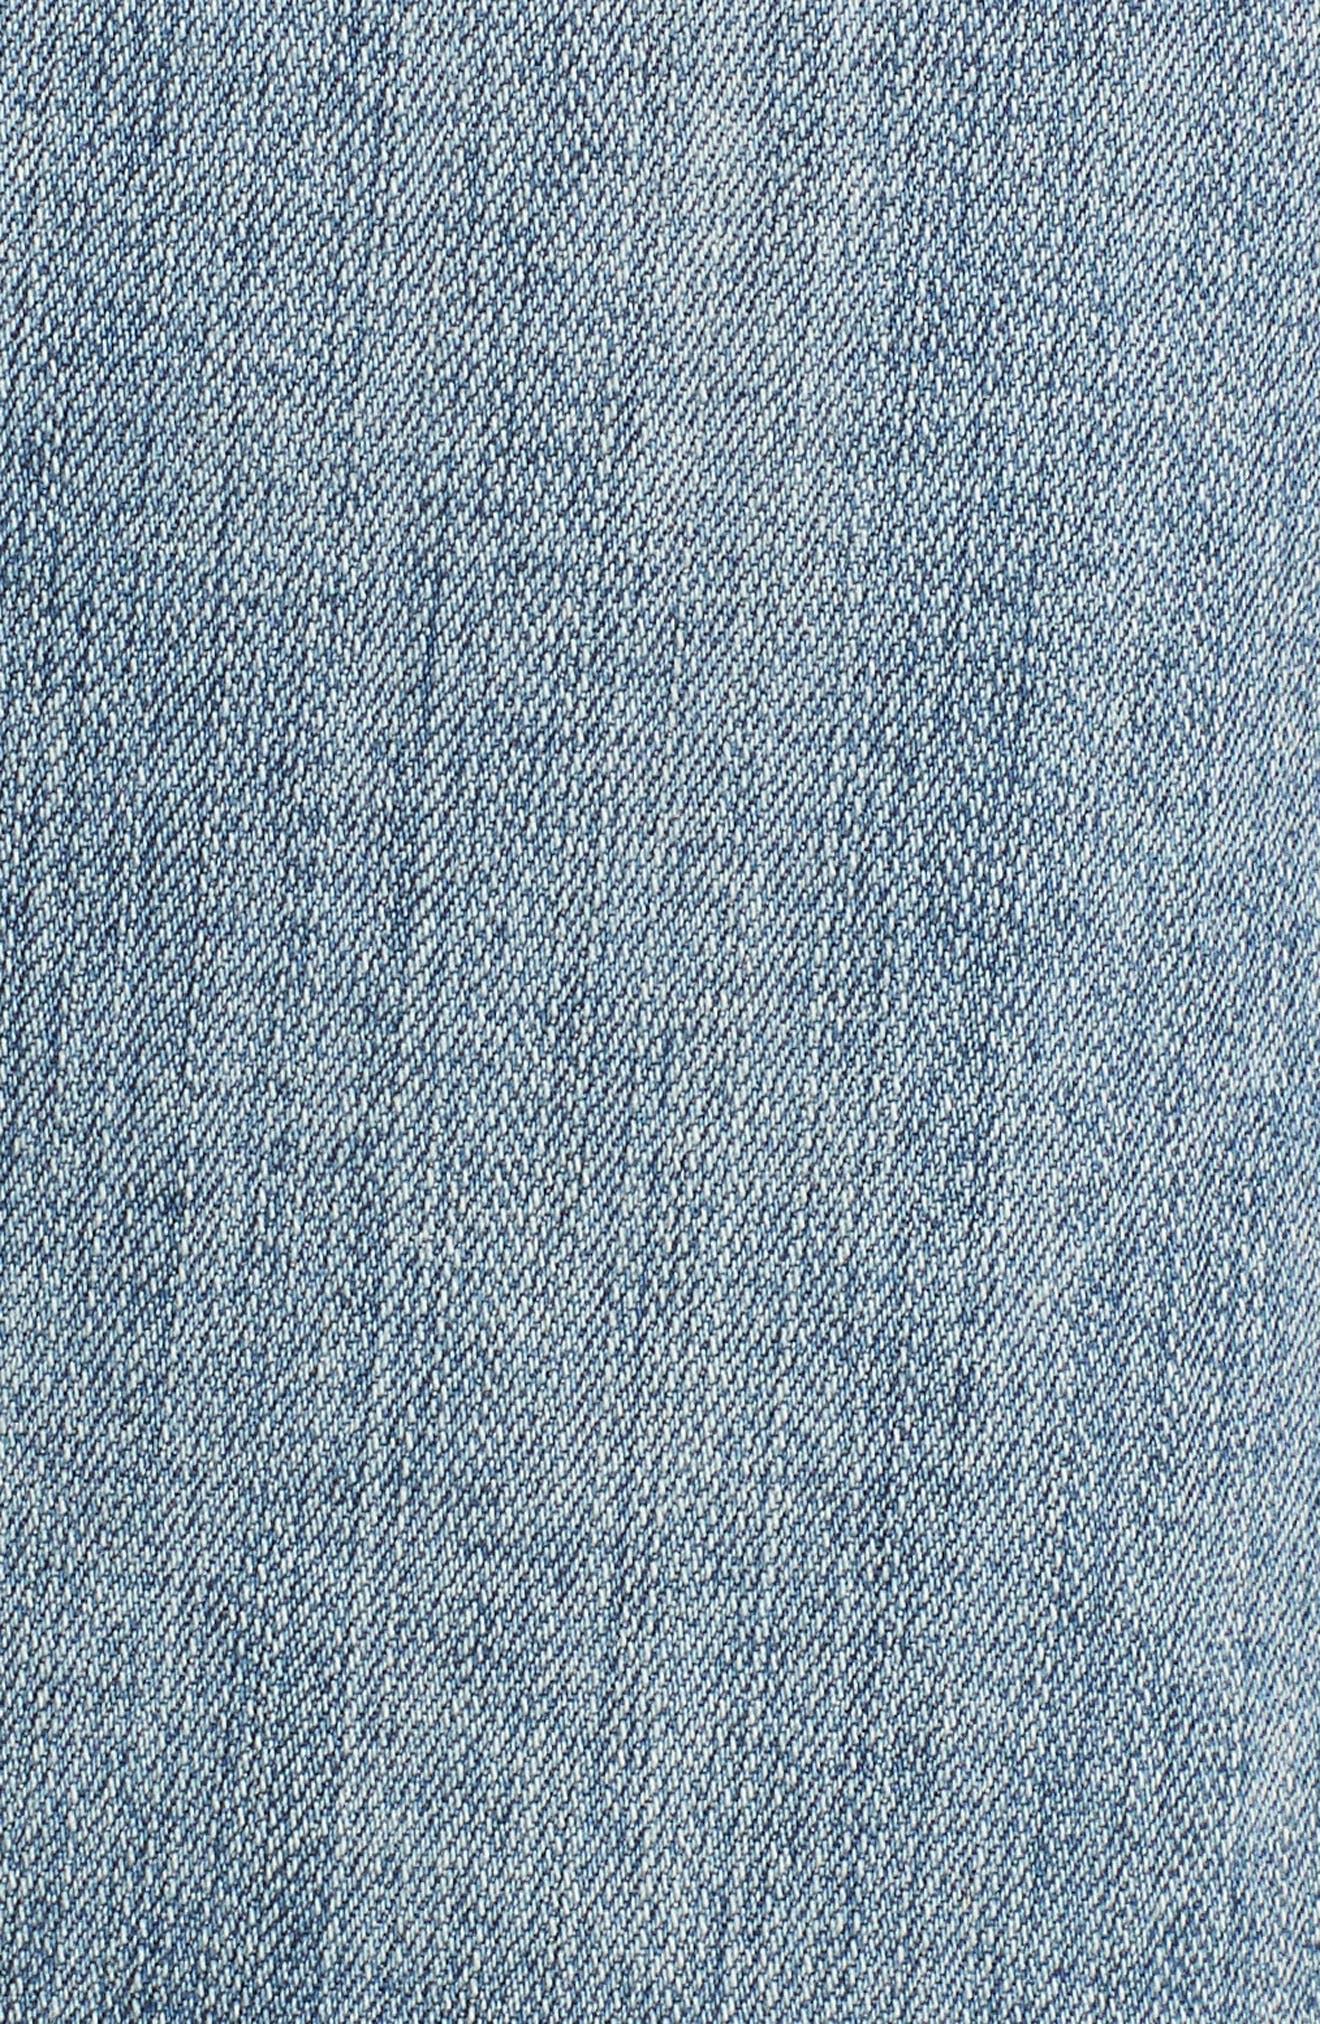 Belted Stretch Denim Skirt,                             Alternate thumbnail 5, color,                             Galactic Wash